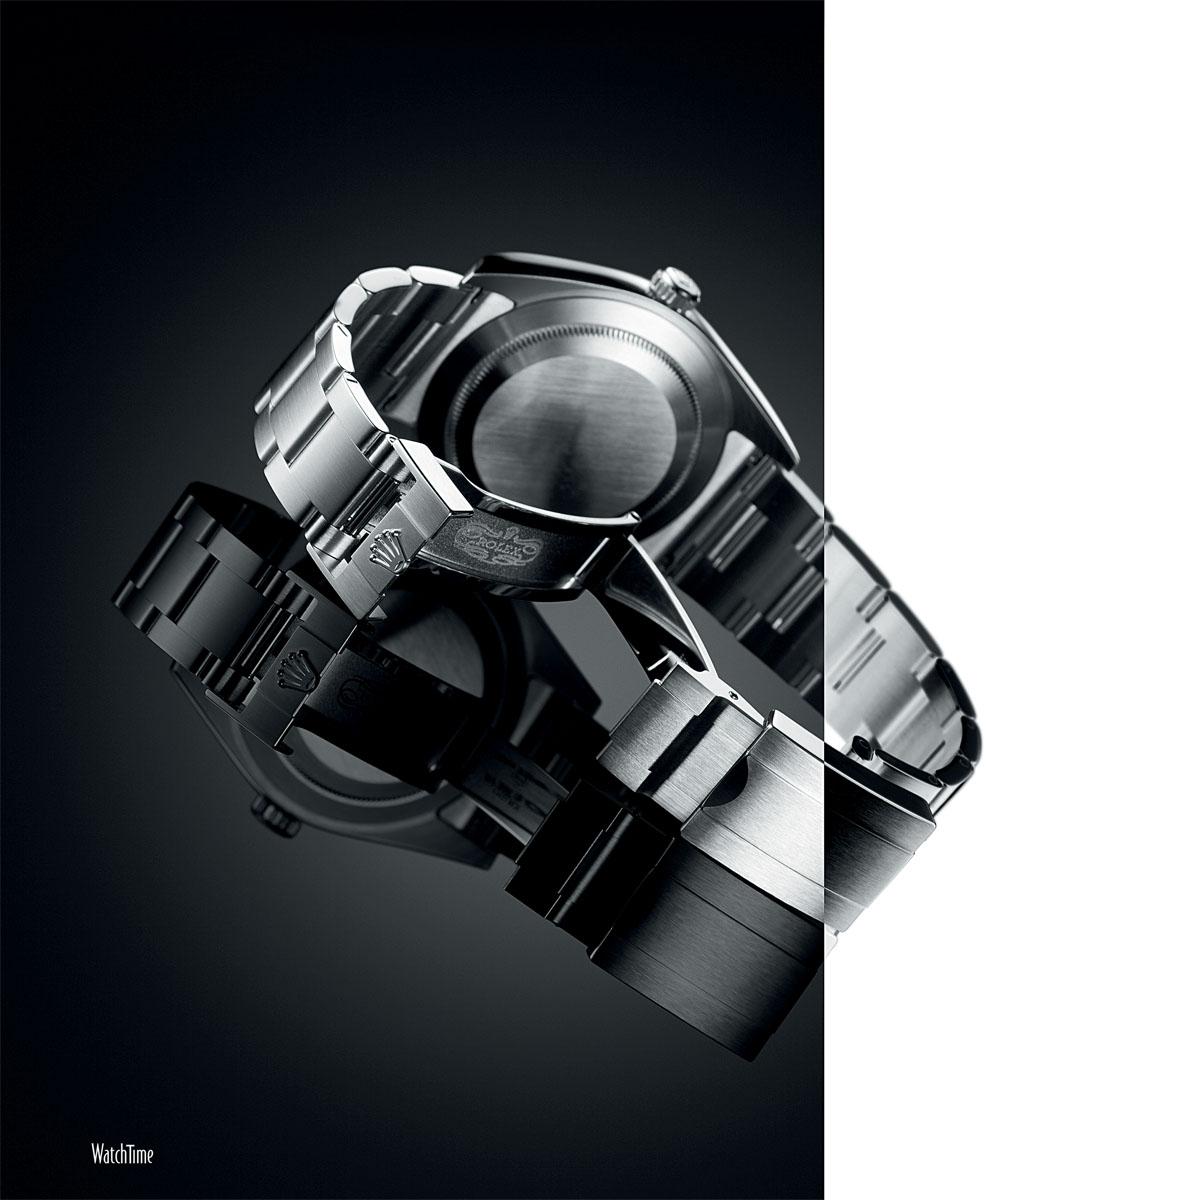 Rolex Explorer 1 39mm ref 214270 - 2